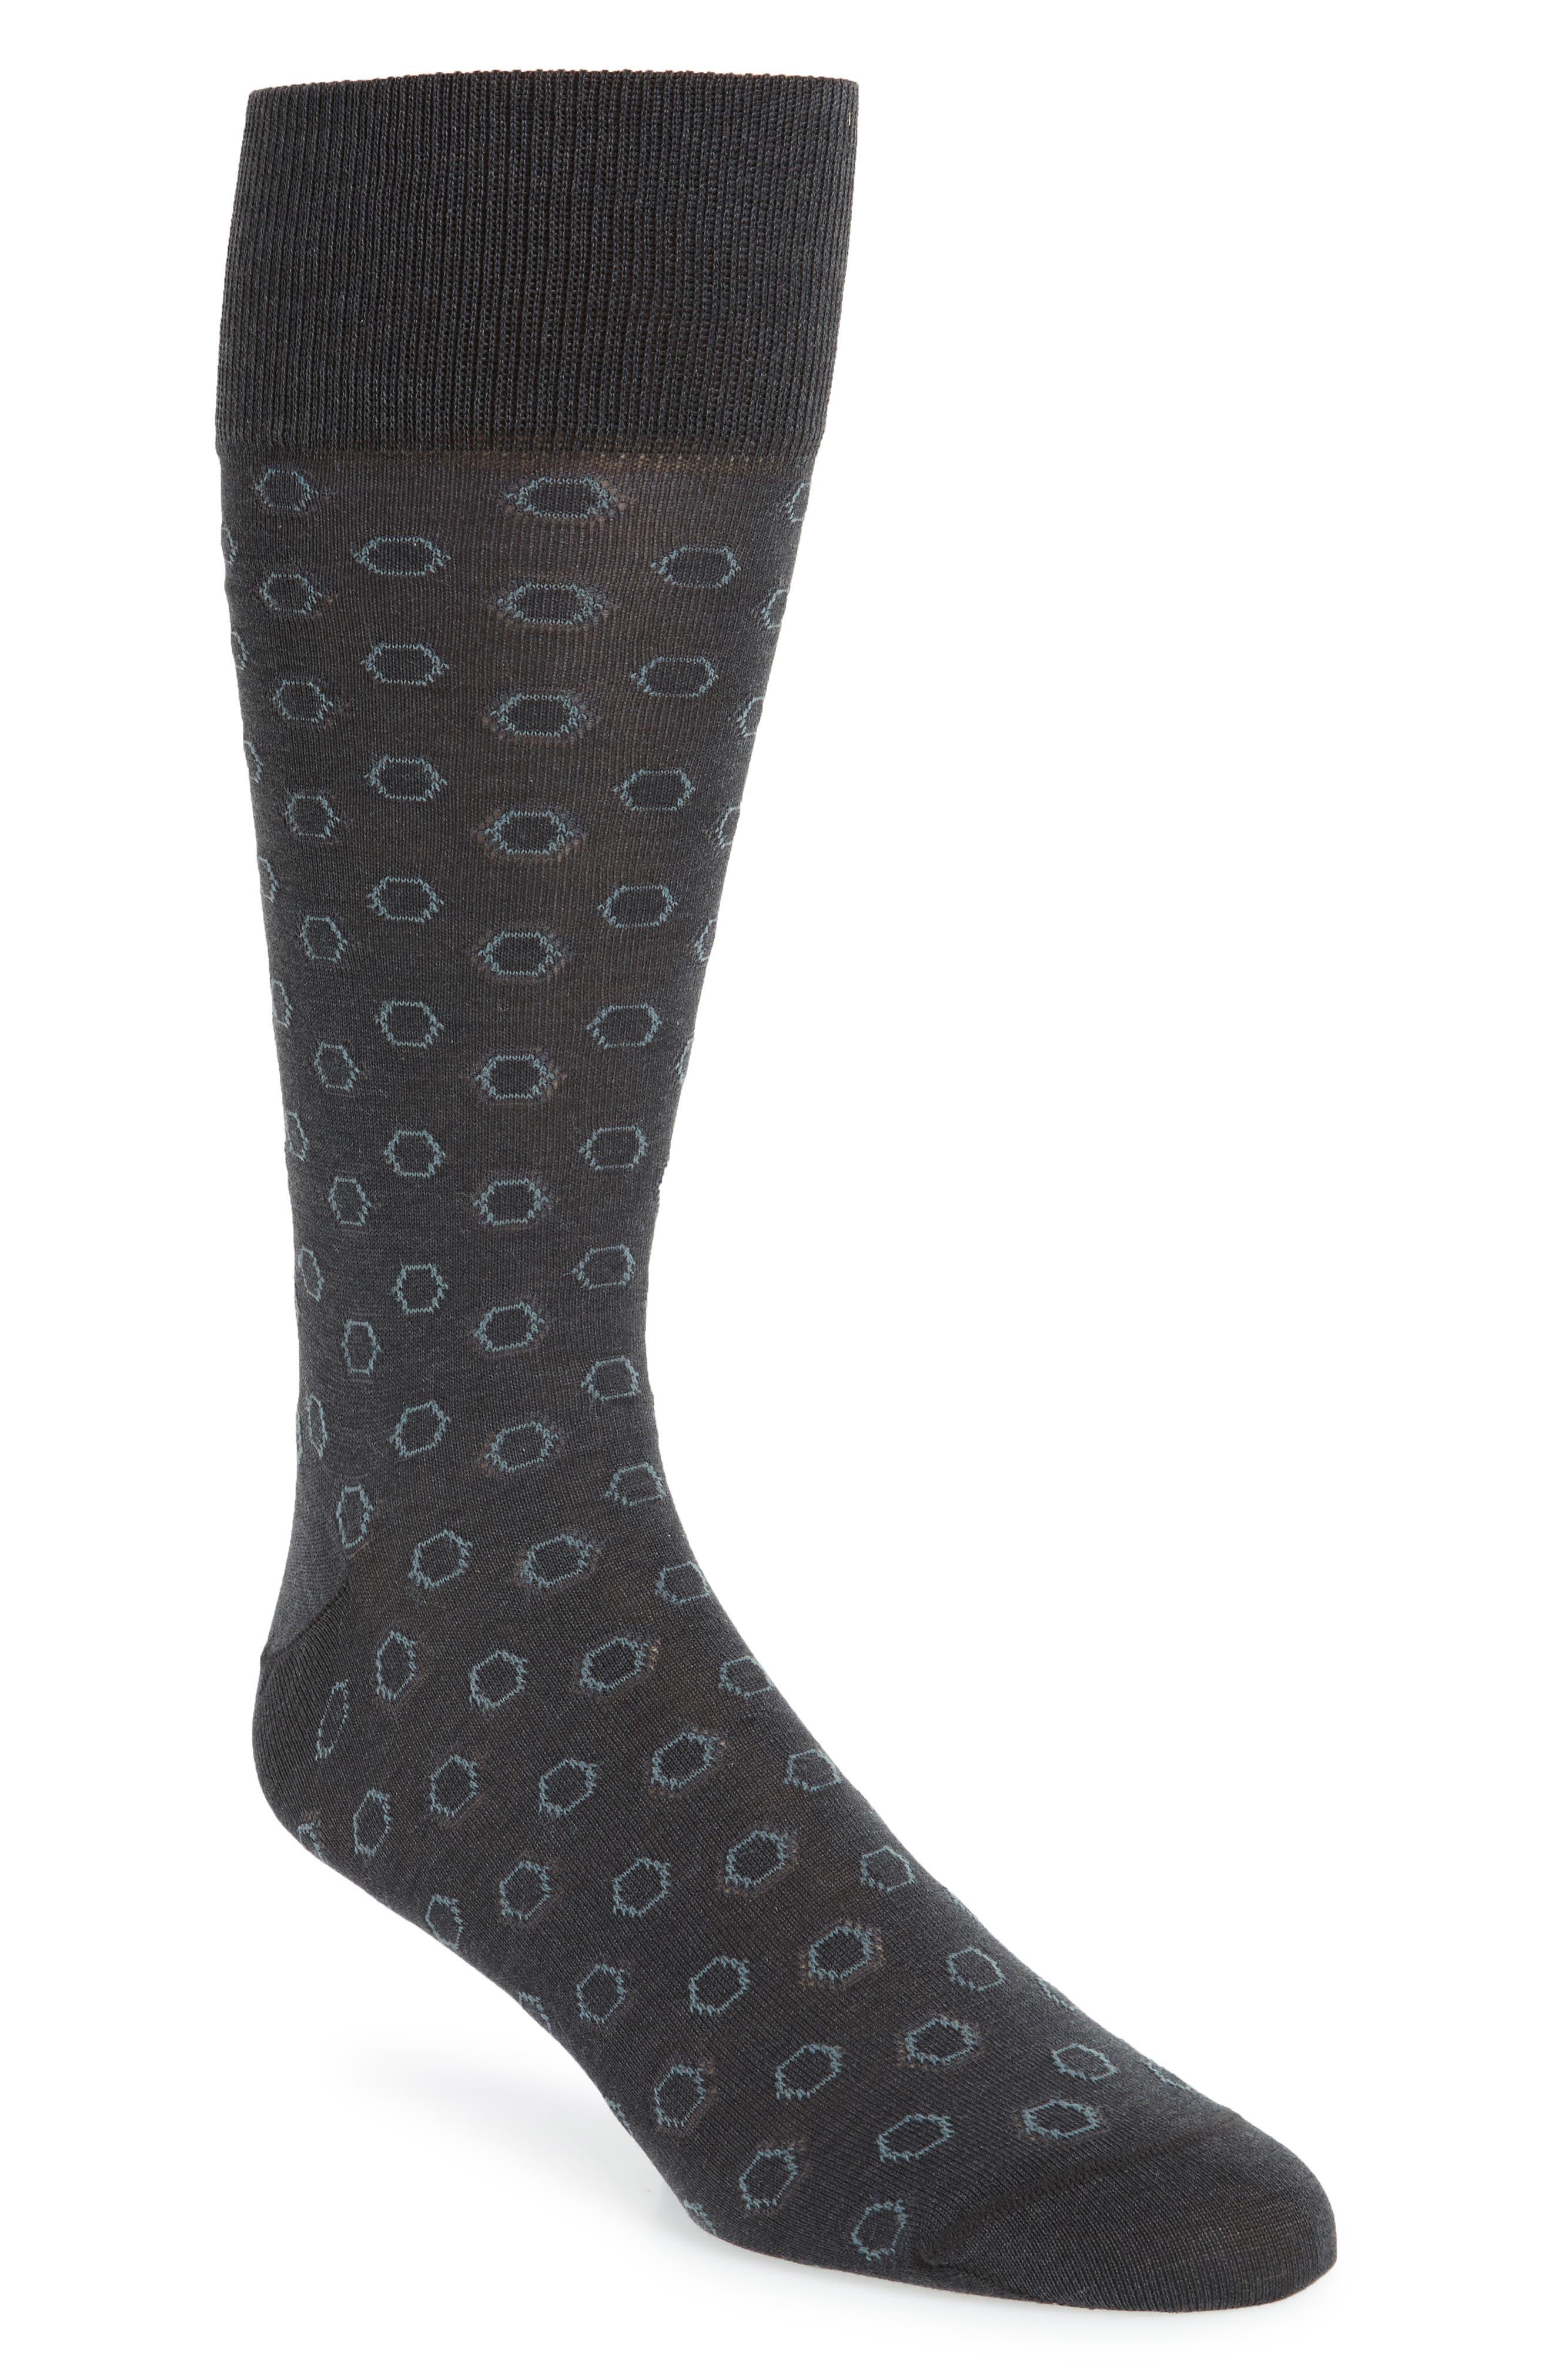 Hexagon Socks,                         Main,                         color, 021